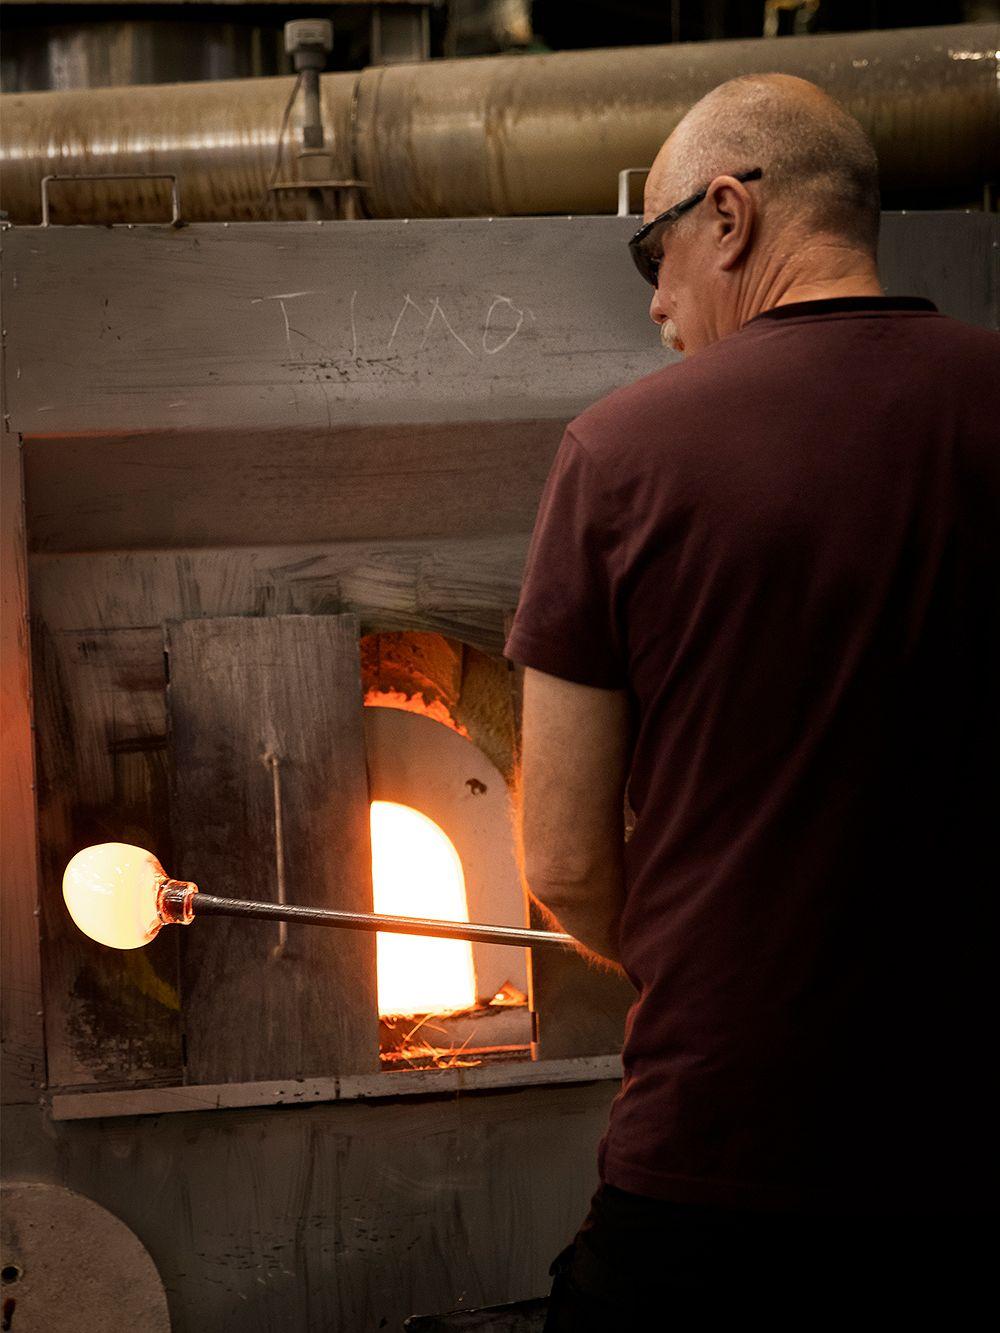 Iittala master glassblower Heikki Punkari